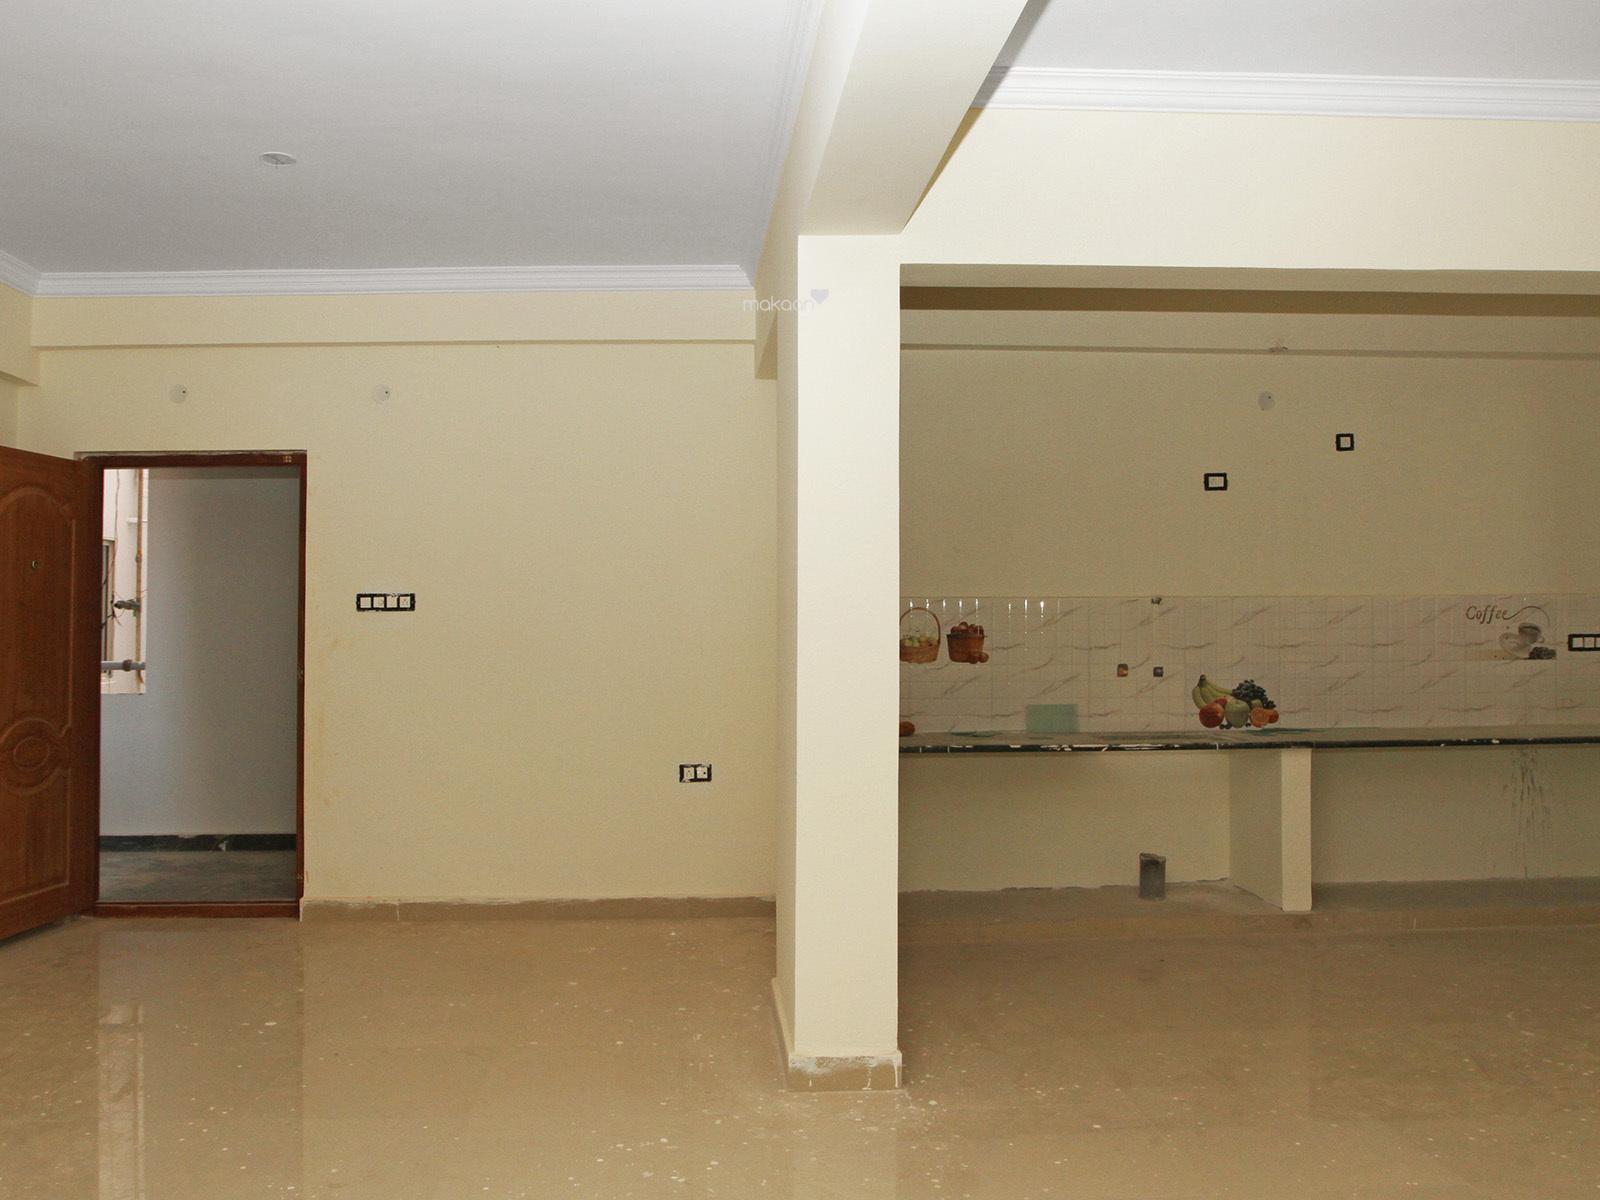 1198 sq ft 2BHK 2BHK+2T (1,198 sq ft) Property By Proptiger In Honey Dew, Horamavu